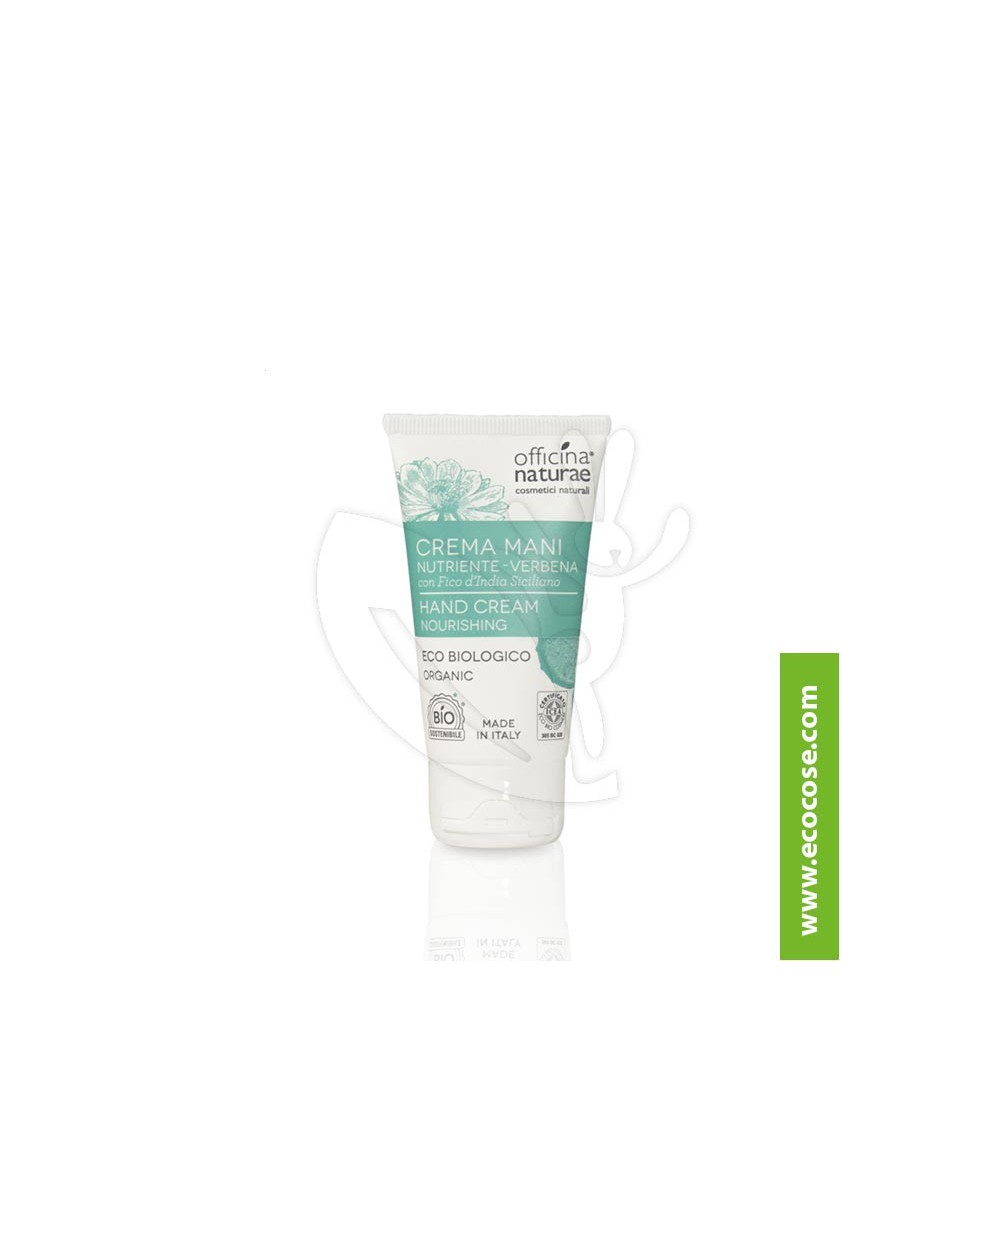 Officina Naturae - Gli Innovattivi - Crema mani nutriente verbena